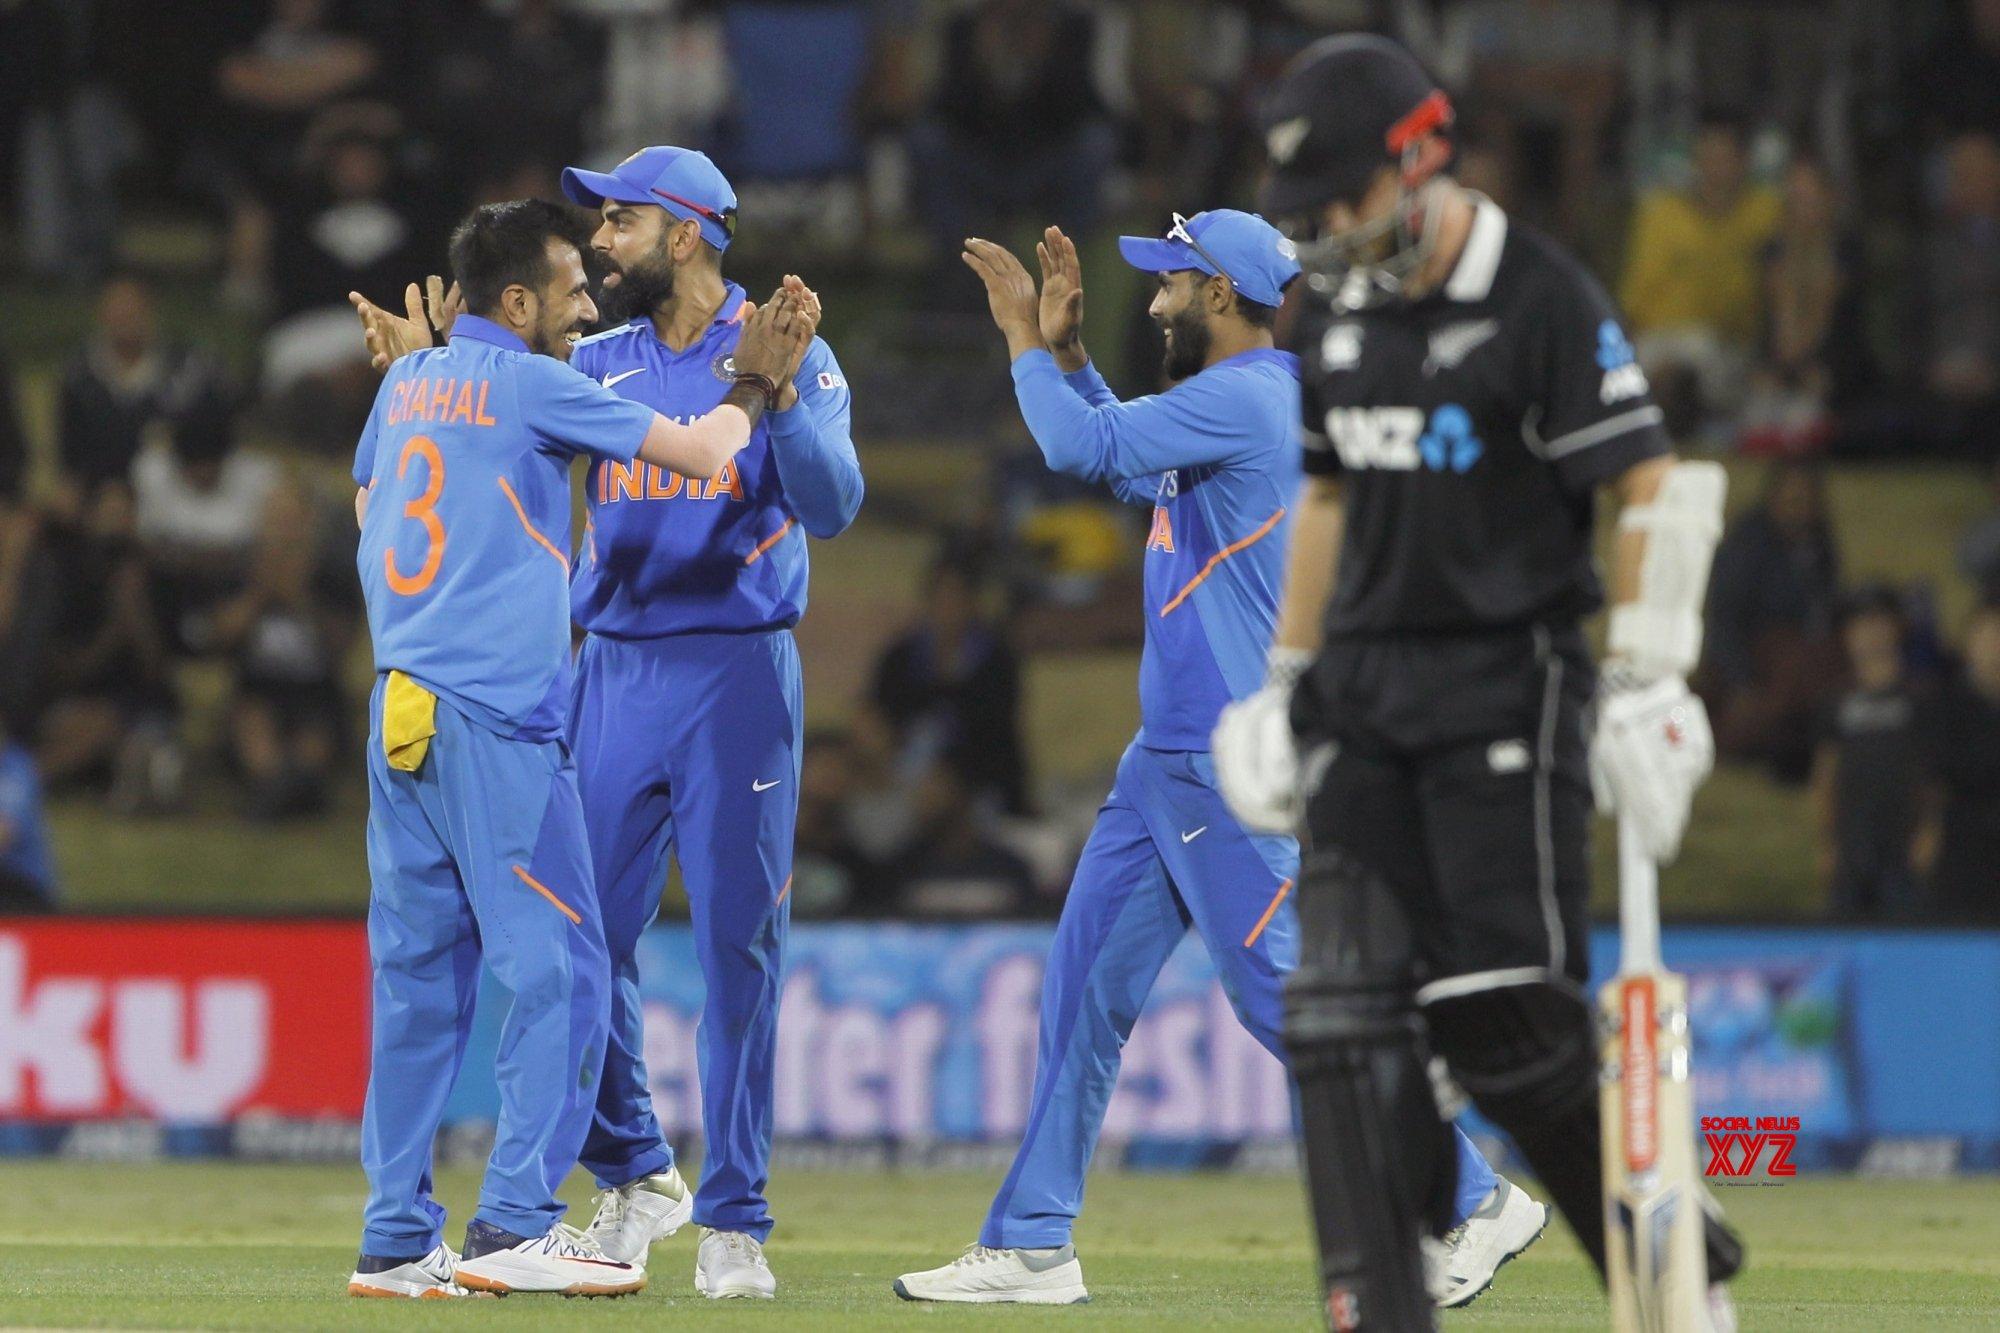 Mount Maunganui: 3rd ODI - India Vs New Zealand (Batch - 10) #Gallery